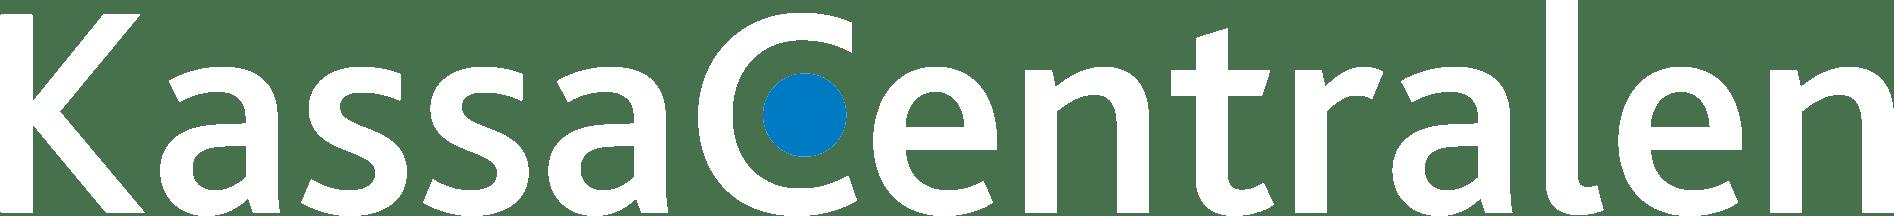 Kassacentralen logo vit